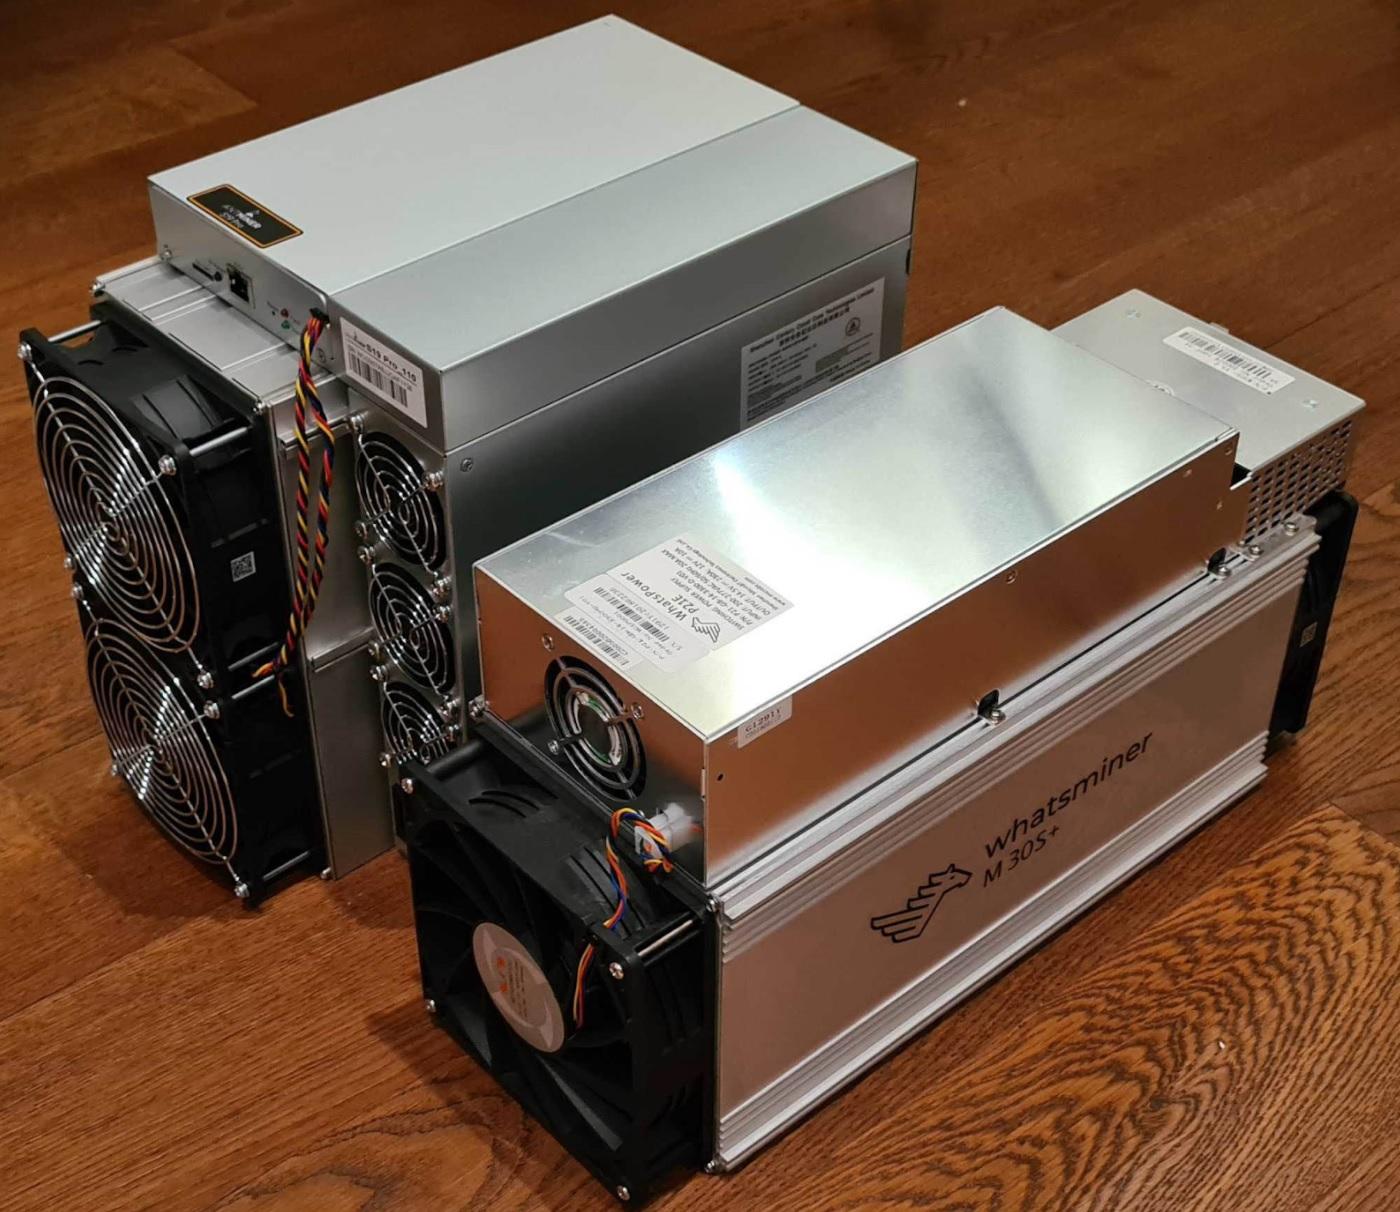 Hut 8 приобрел биткоин-майнеры MicroBT на сумму почти $45 млн